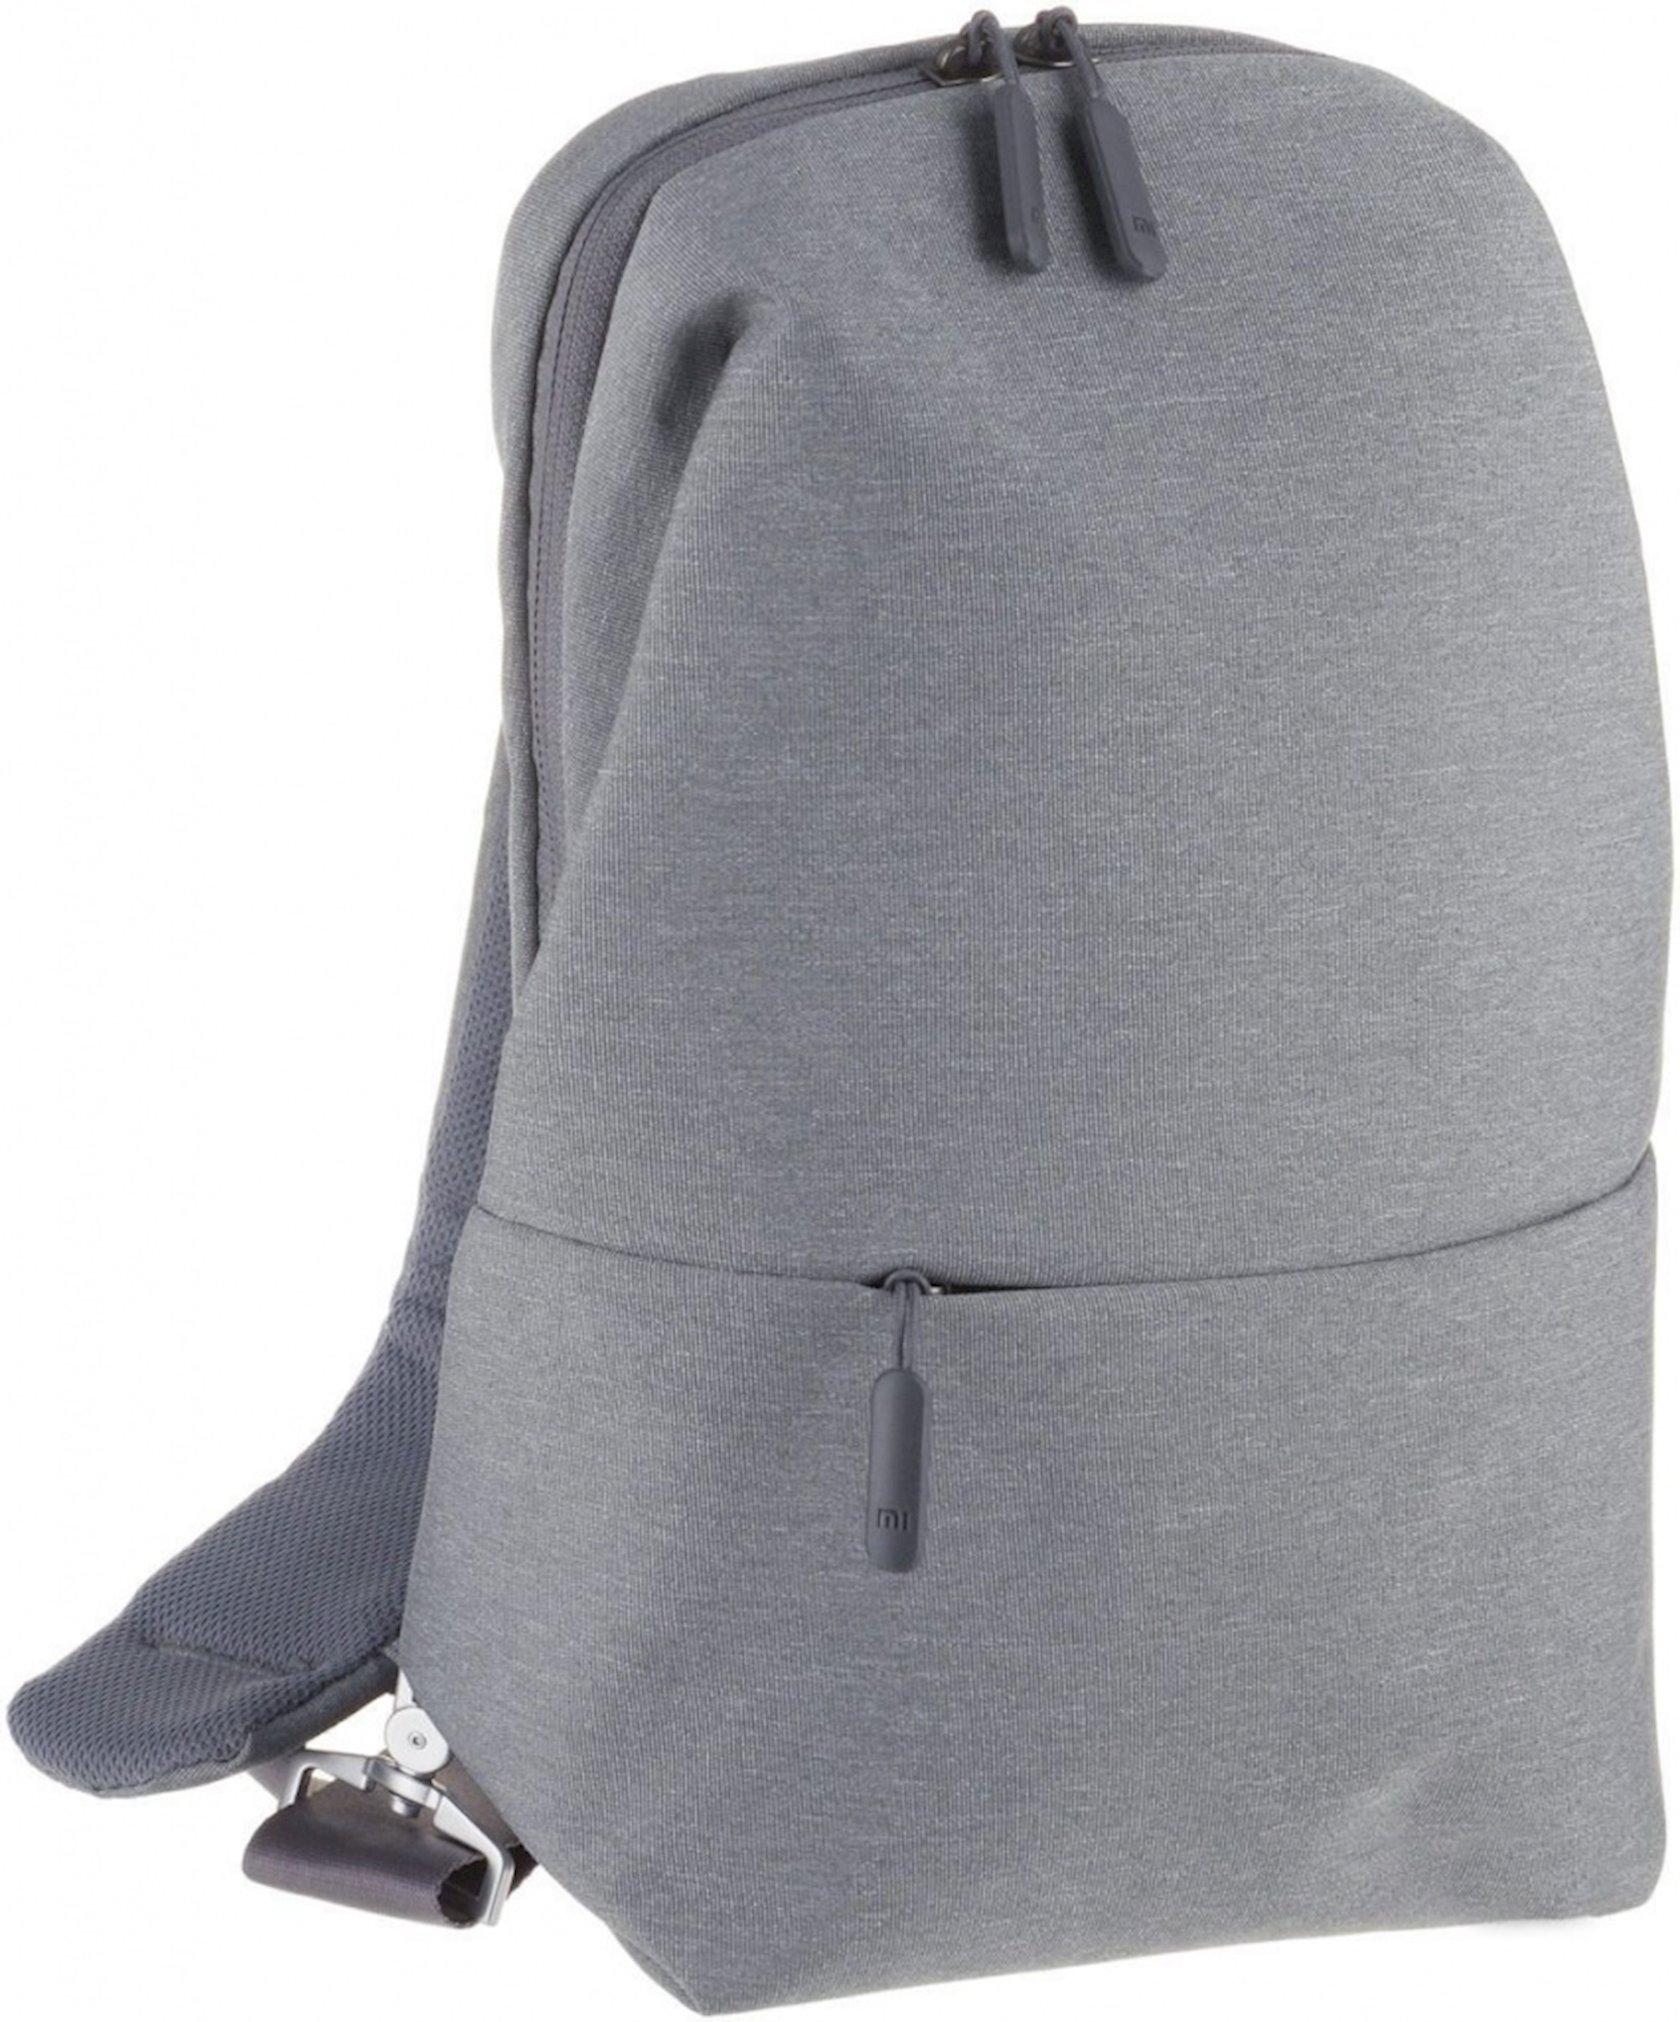 Bel çantası Xiaomi Mi City Sling Bag (Light Grey)